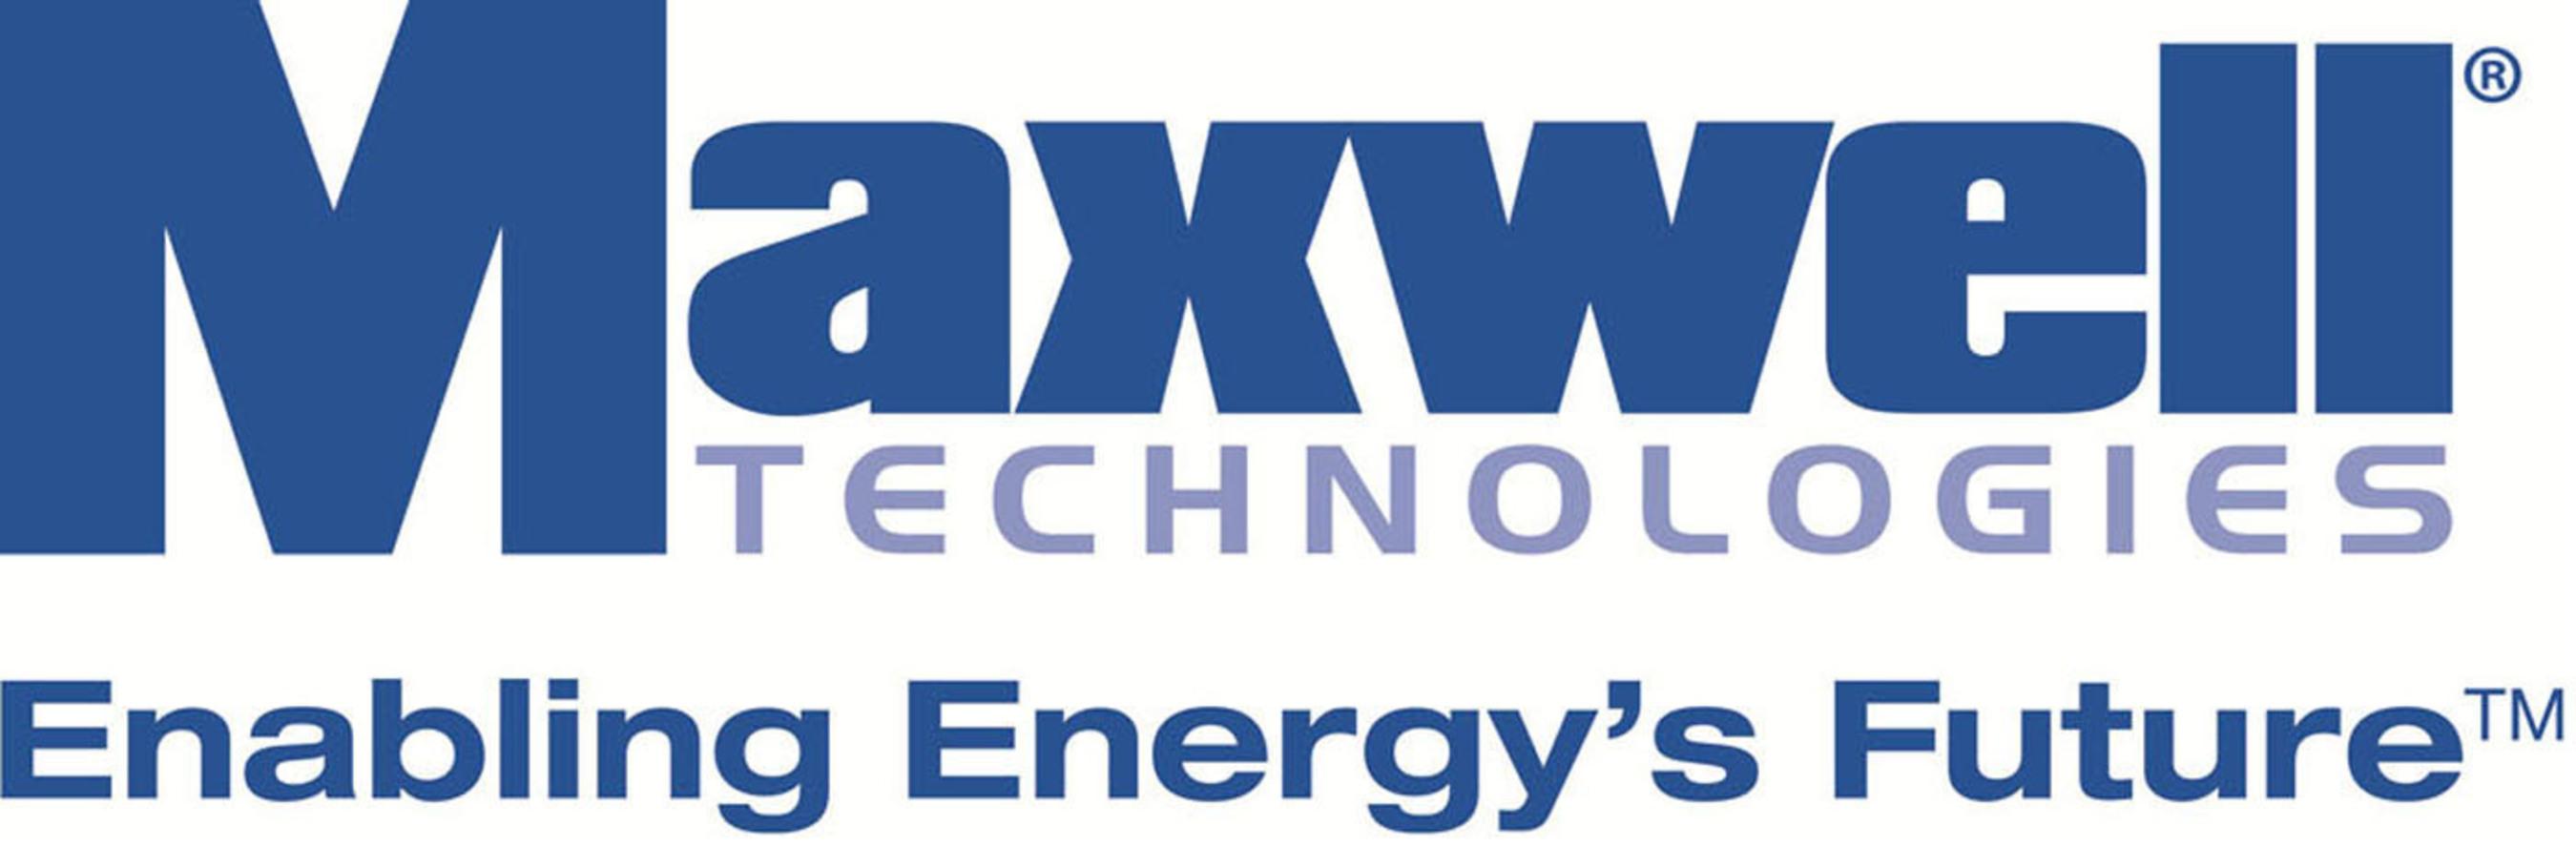 Enabling Energy's Future